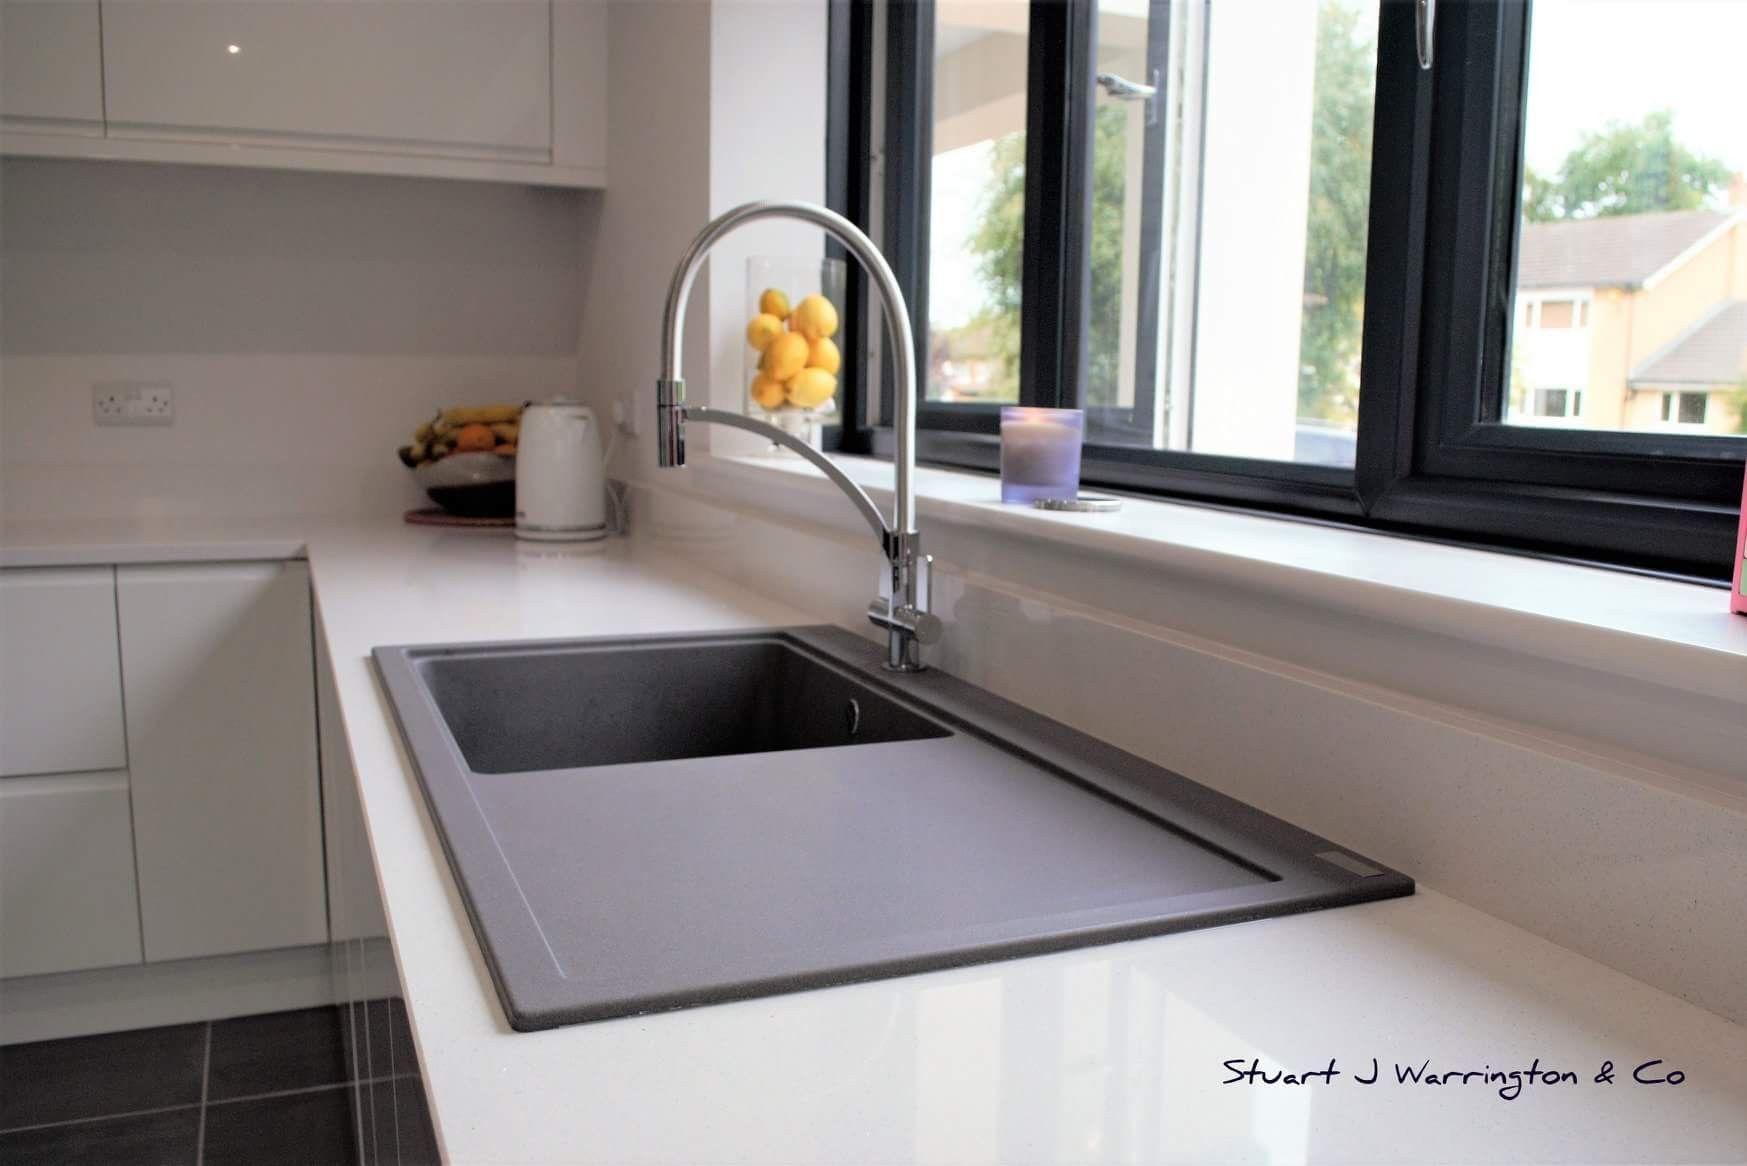 Piano Cottura Fragranite Grigio franke maris fragranite sink with franke wave tap | lavelli